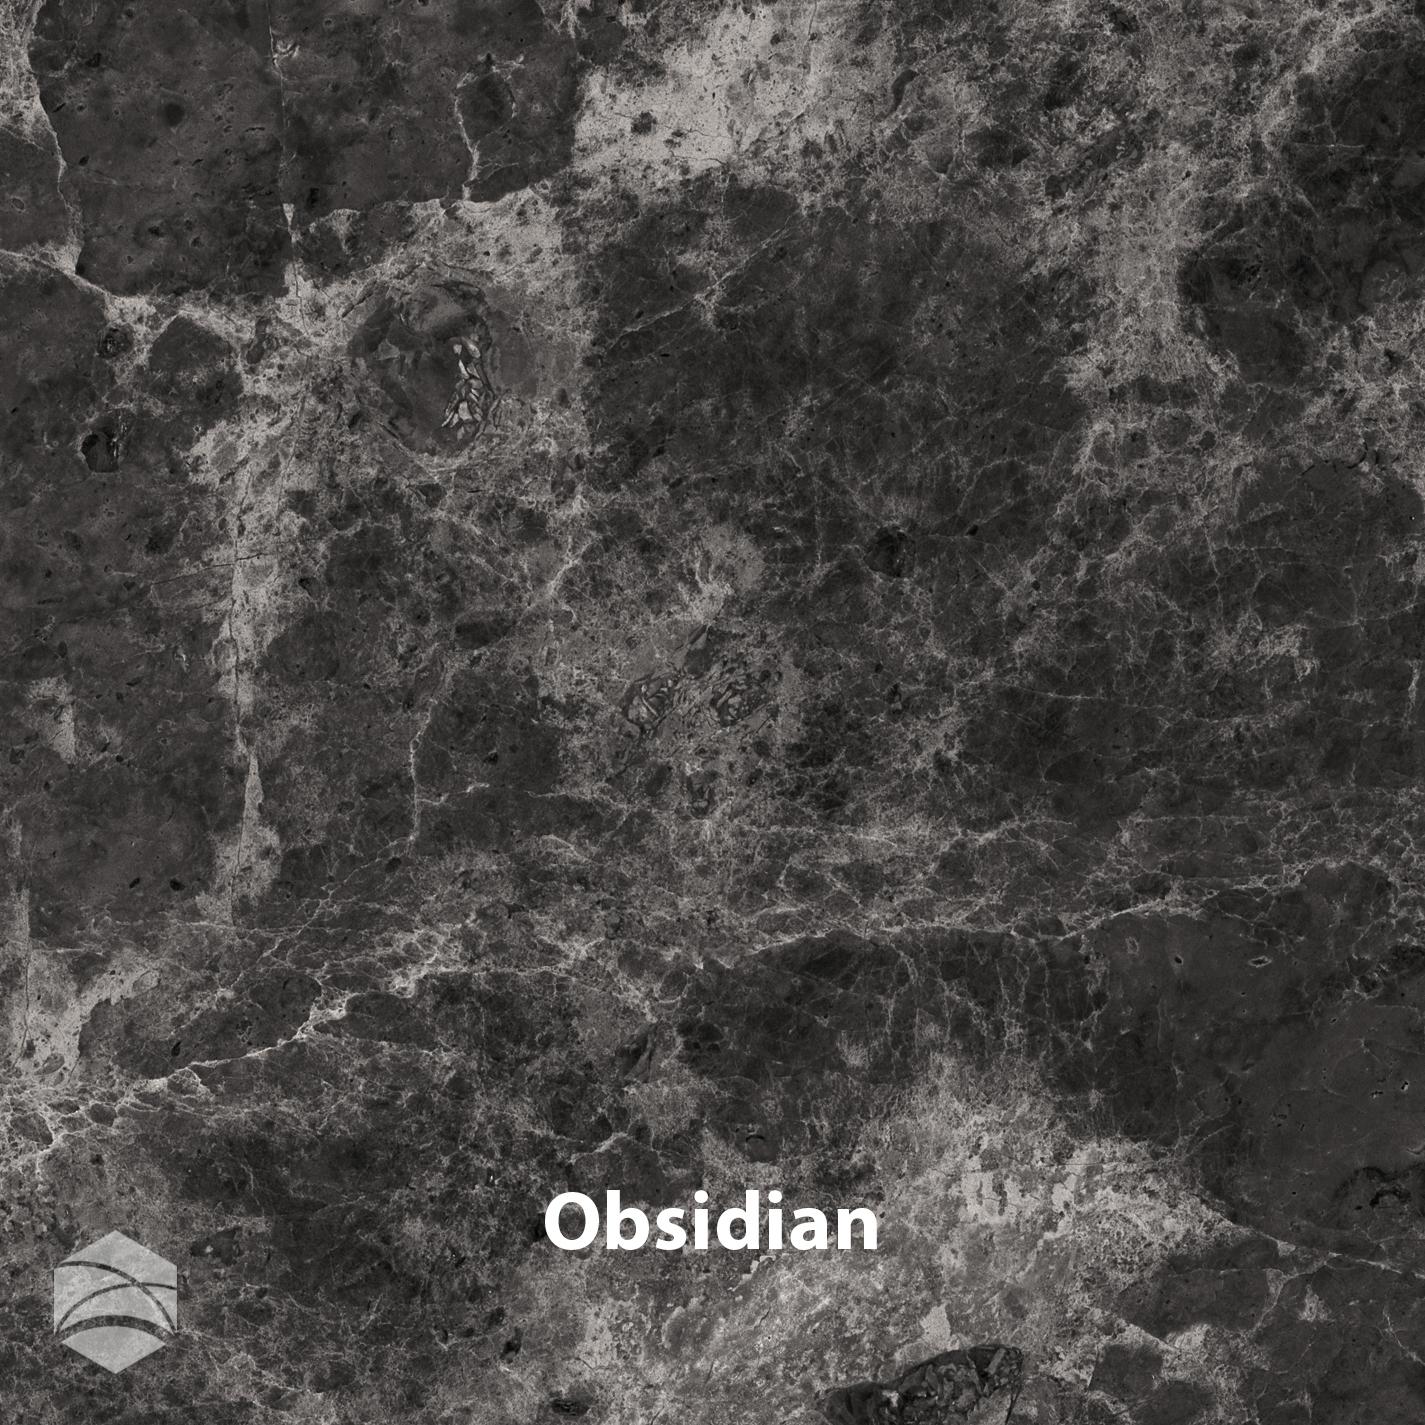 Obsidian_V2_14x14.jpg